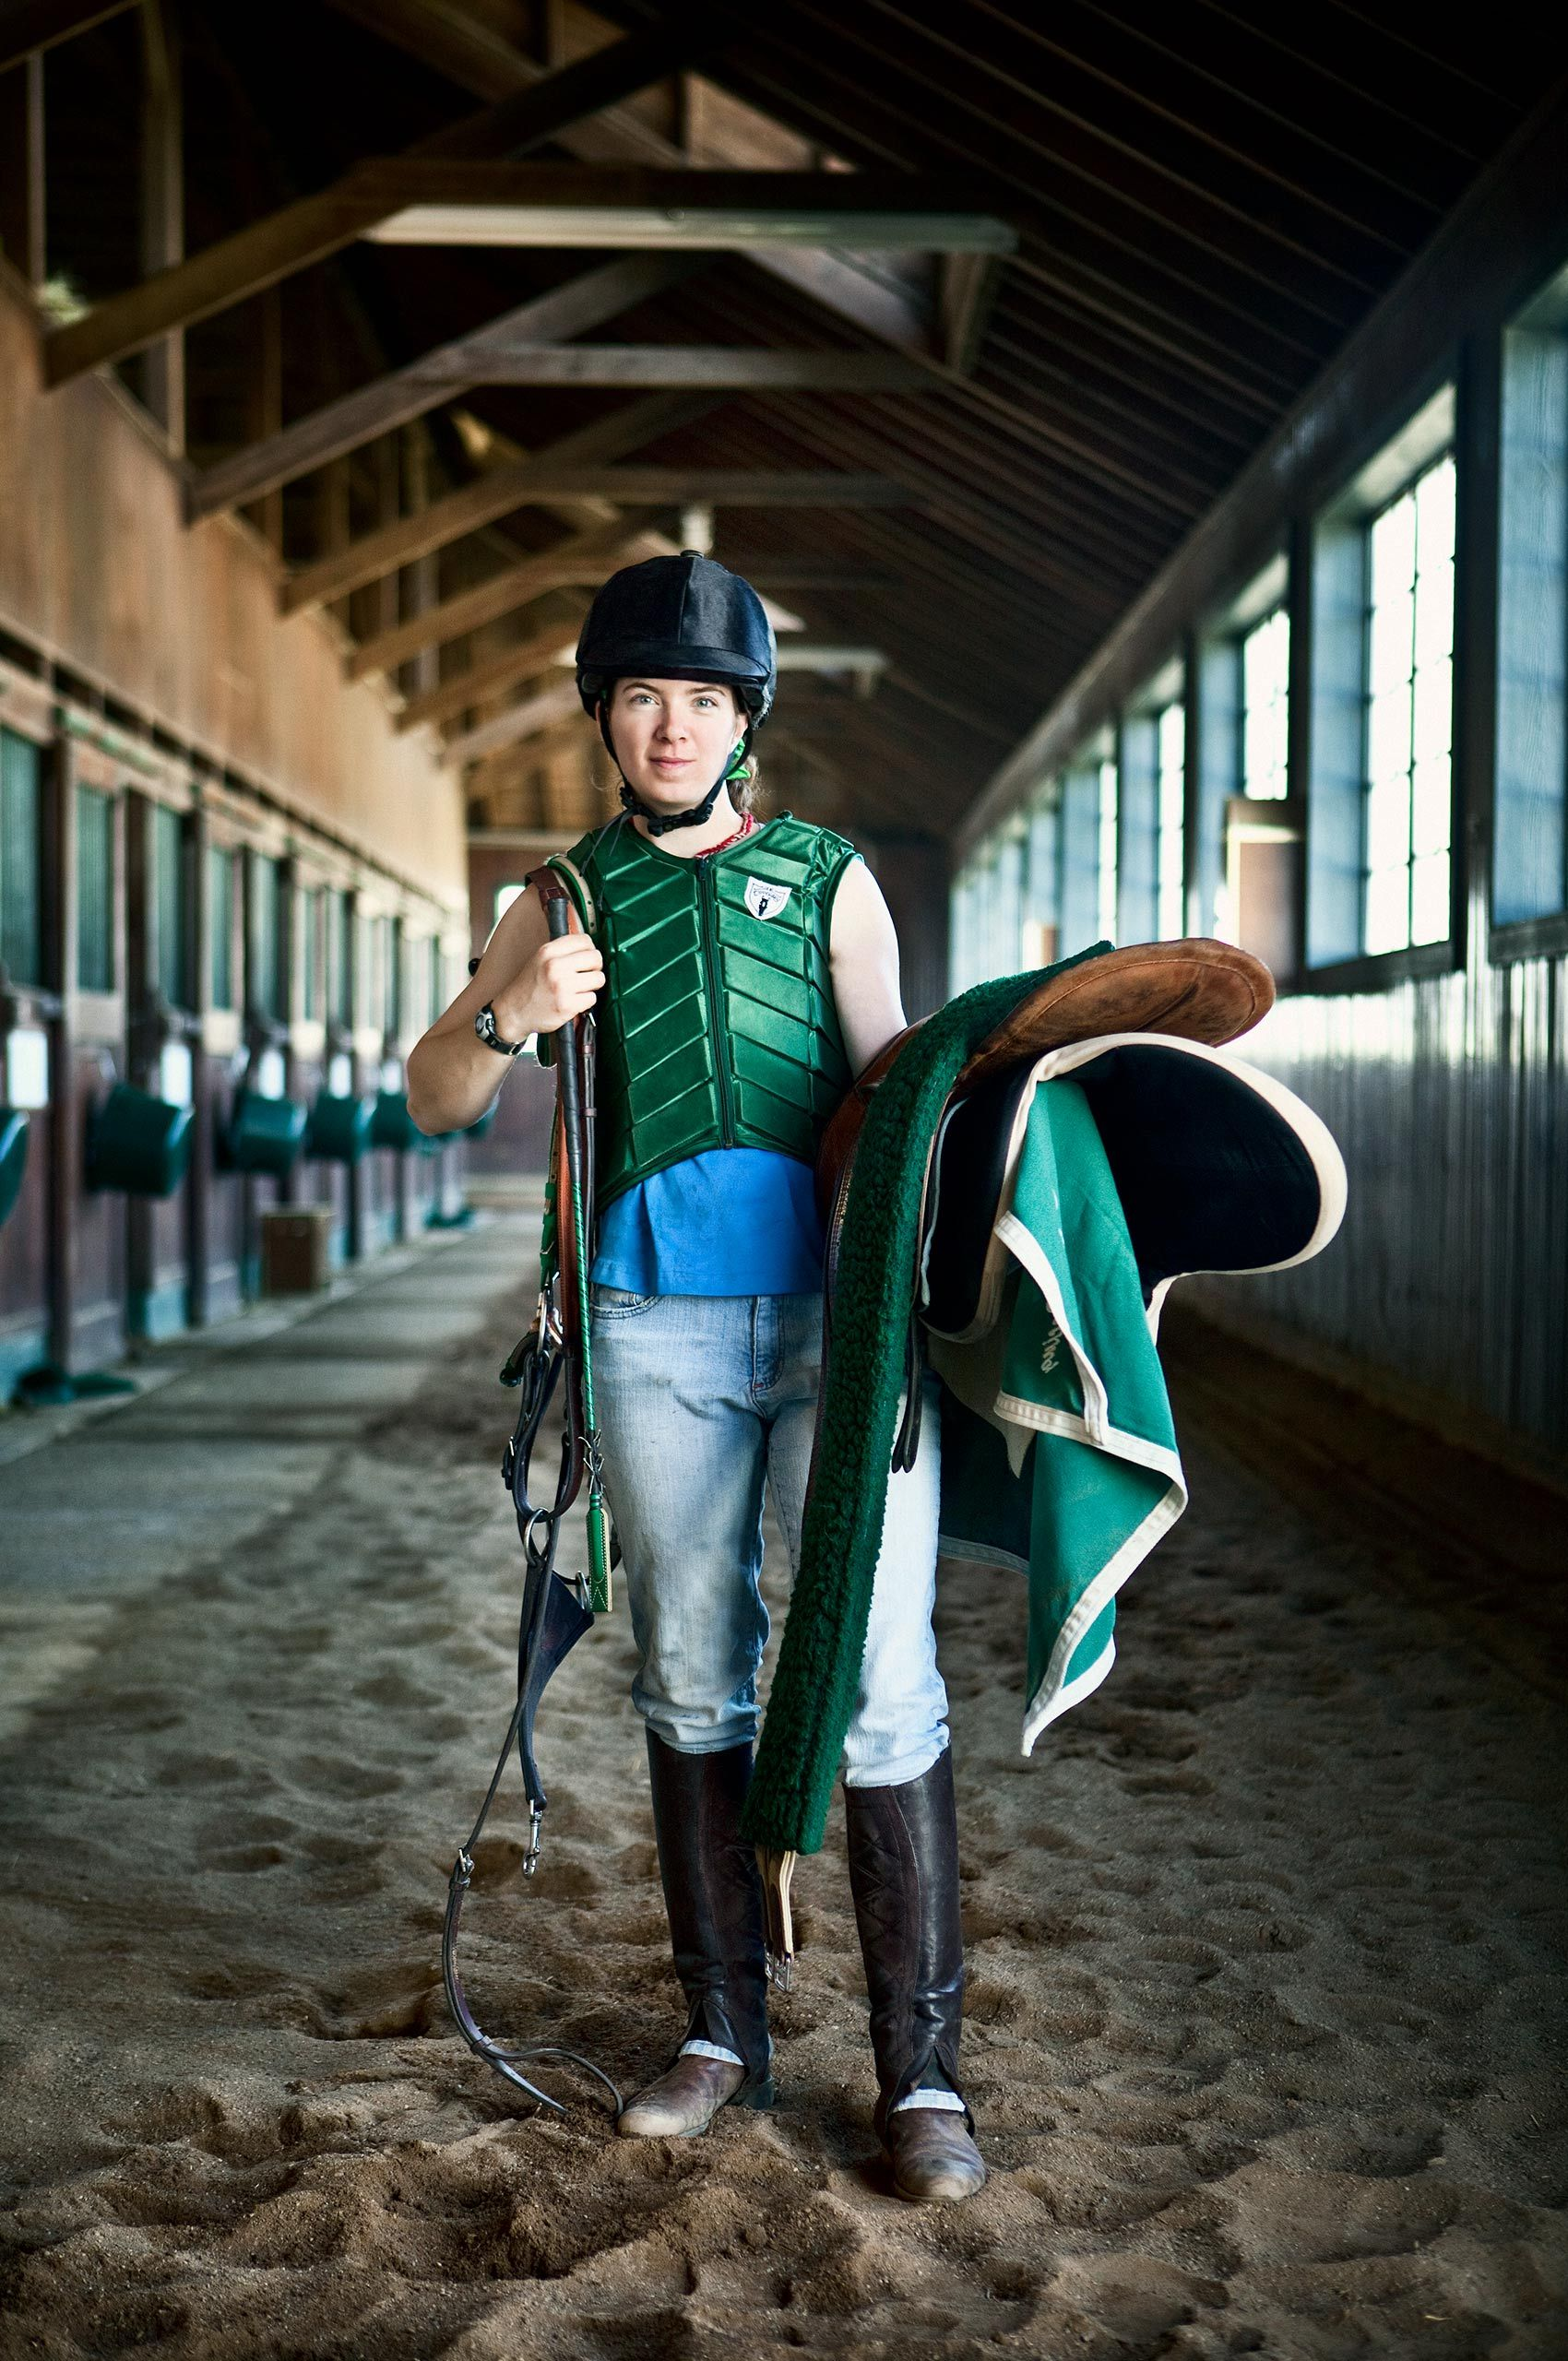 Equestrian-HenrikOlundPhotography.jpg